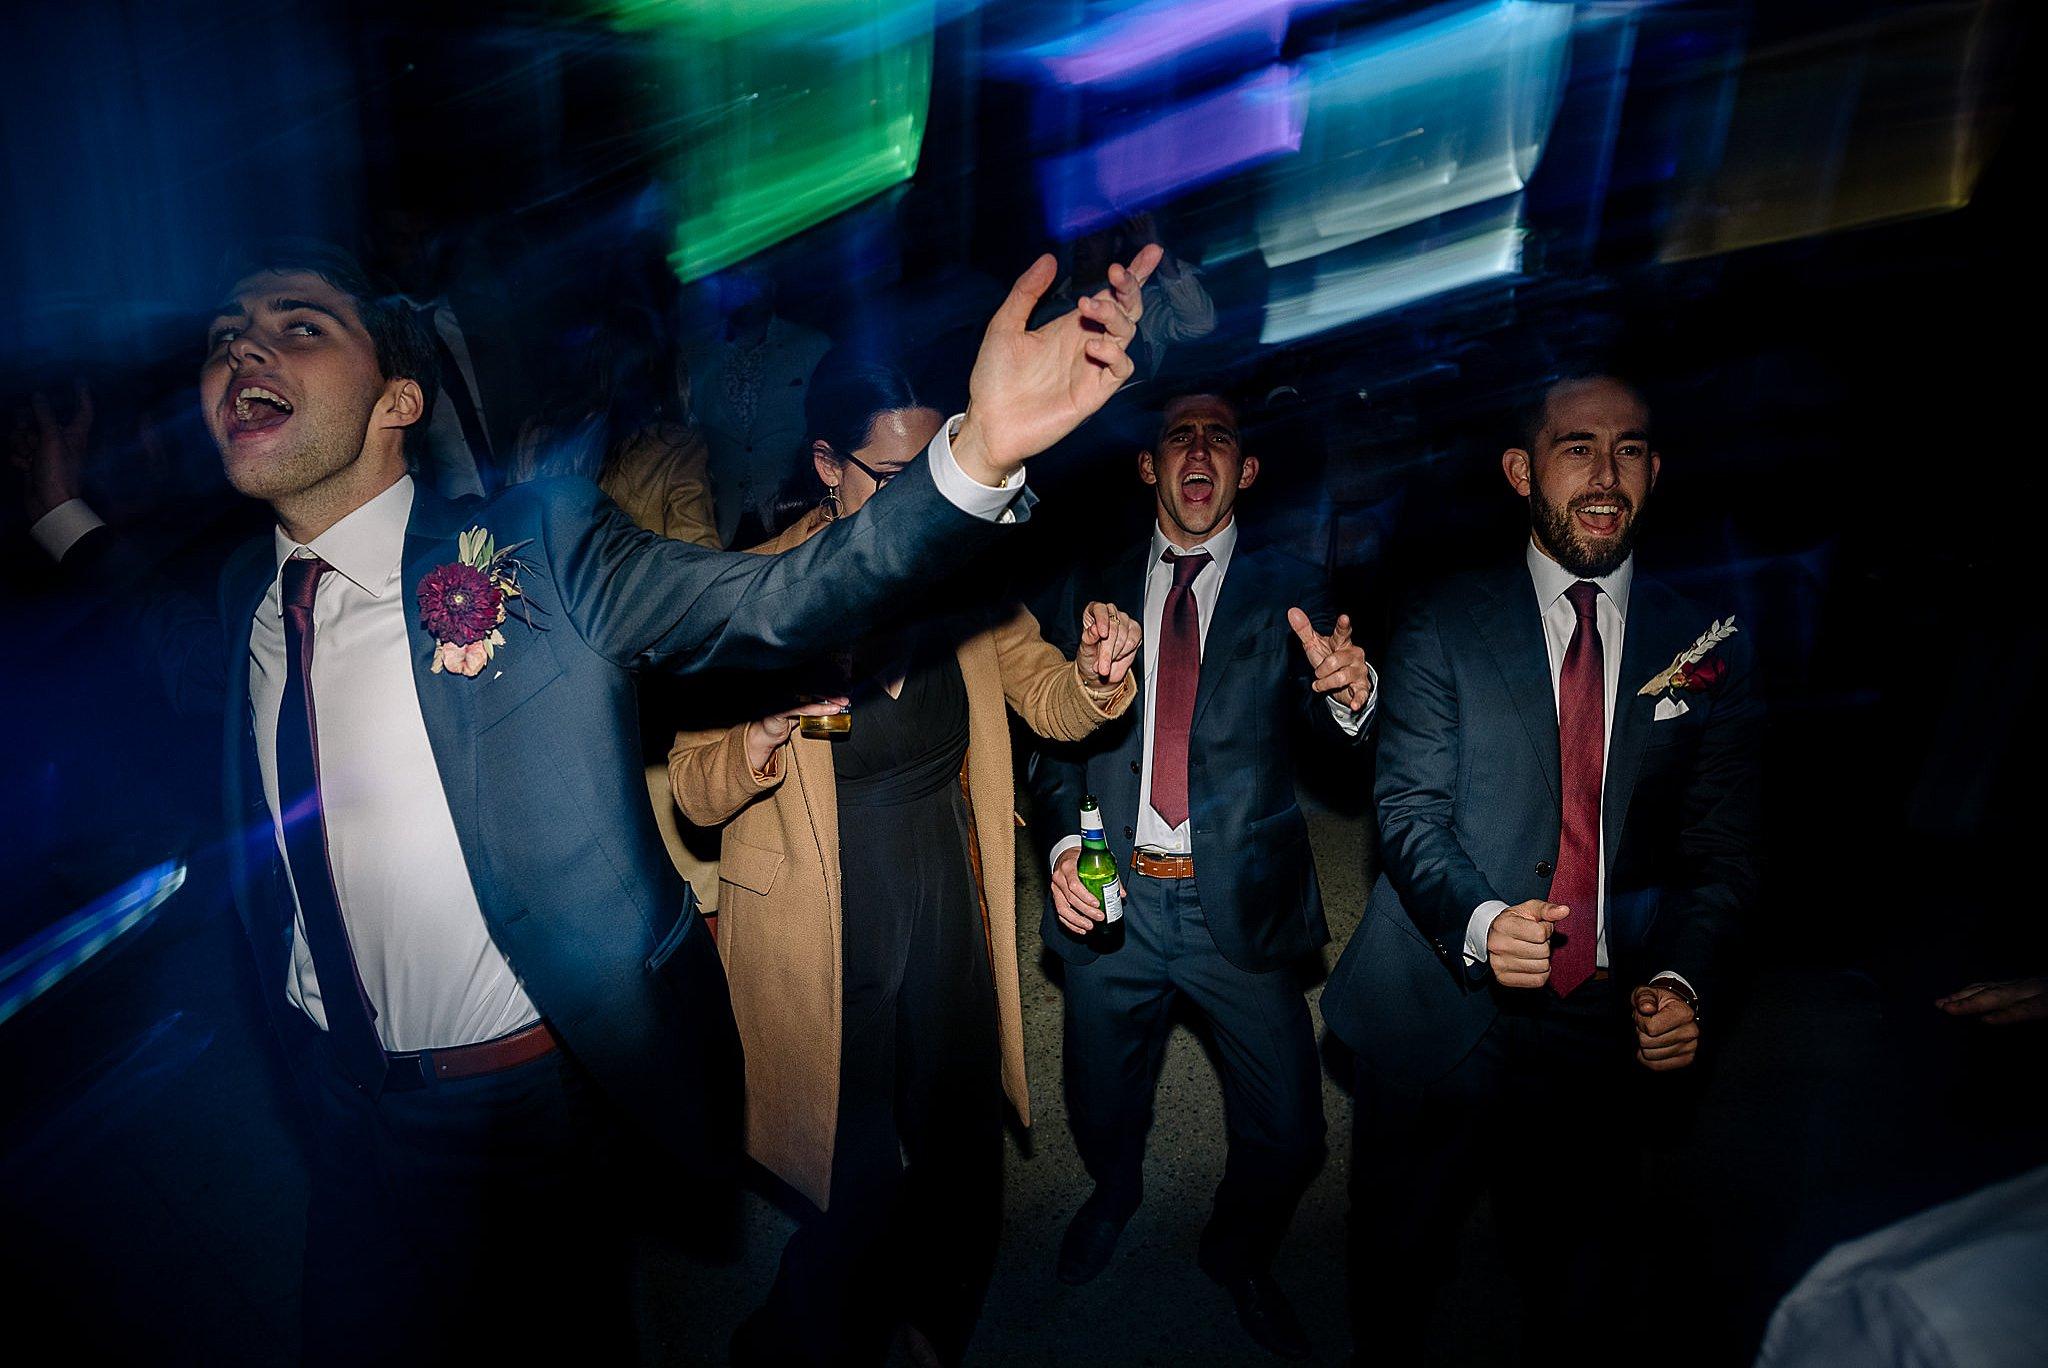 canberra florist,Canberra Portrait Photography,Keepsakephoto by the Keeffes,Canberra Wedding Photography,Canberra Wedding Photographer,canberra wedding,ACT weddings,ACT wedding photographer,canberra weddings,destination wedding,destination wedding photography,Canberra Winter Wedding,Barn Wedding,Wiluna studio,